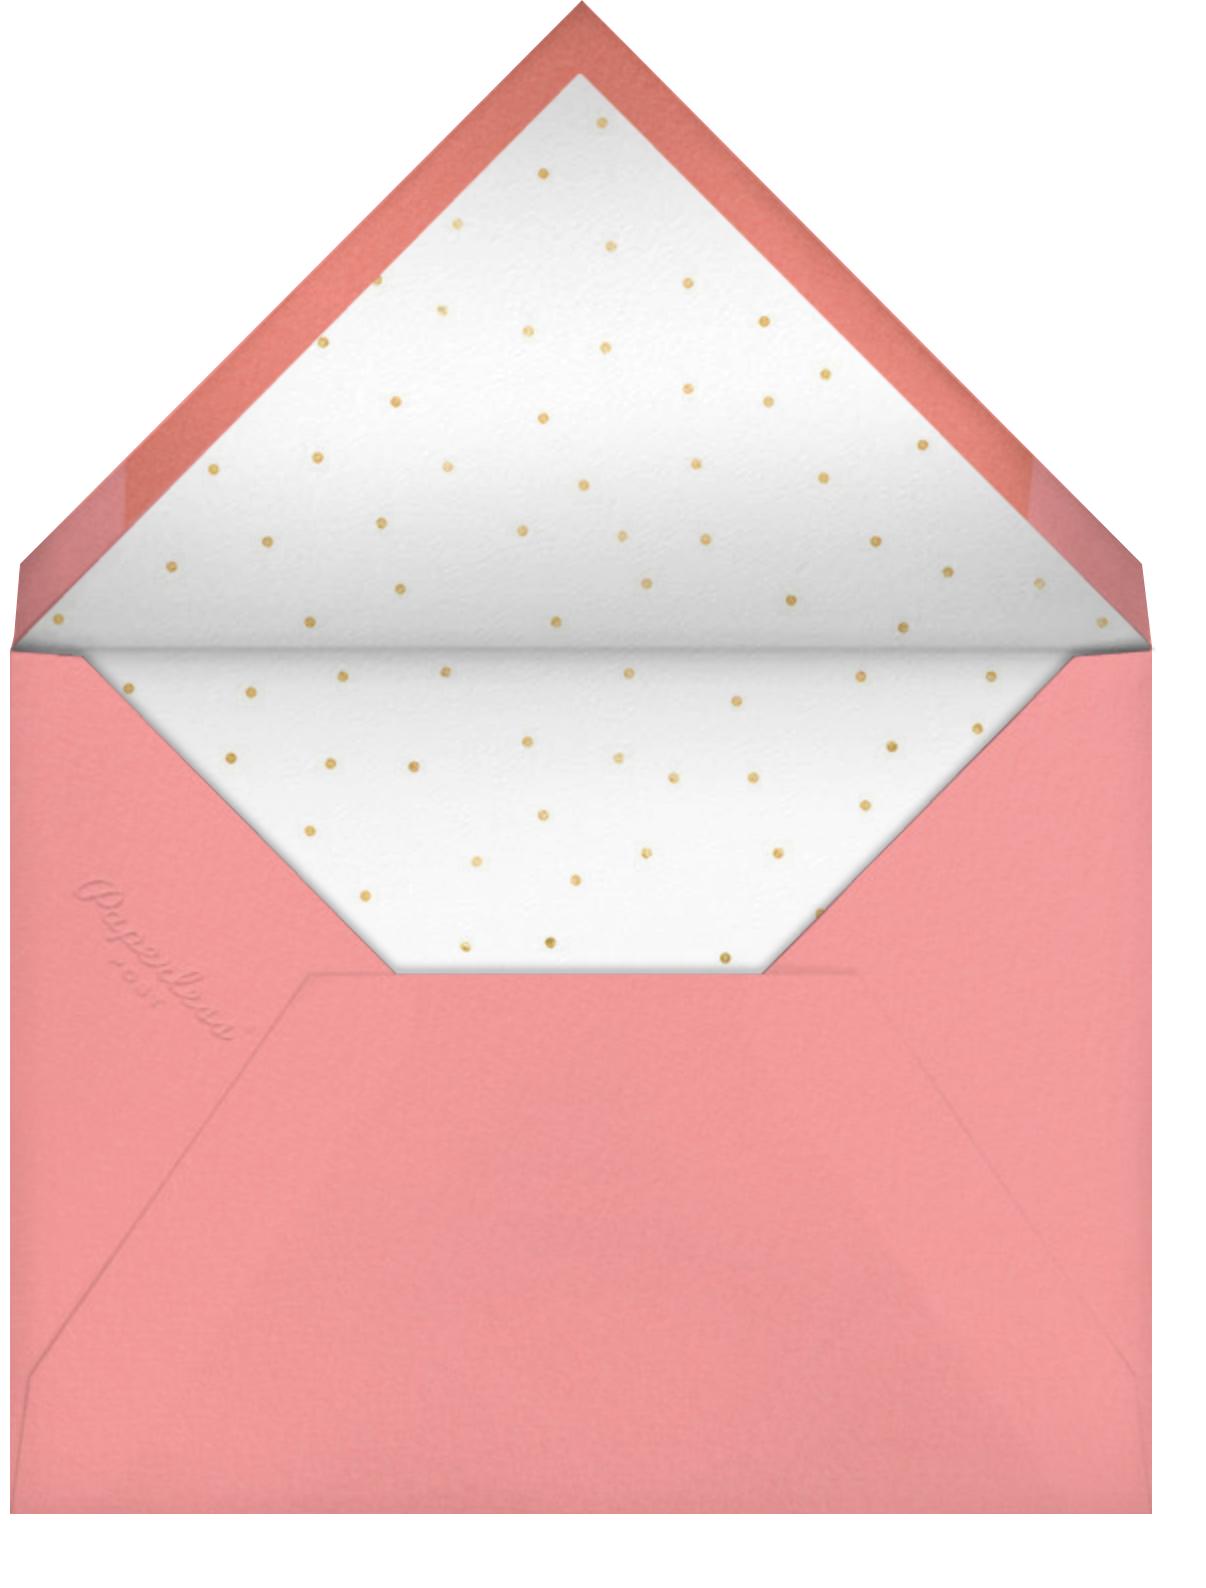 Sweet Tea - Paperless Post - Baby shower - envelope back